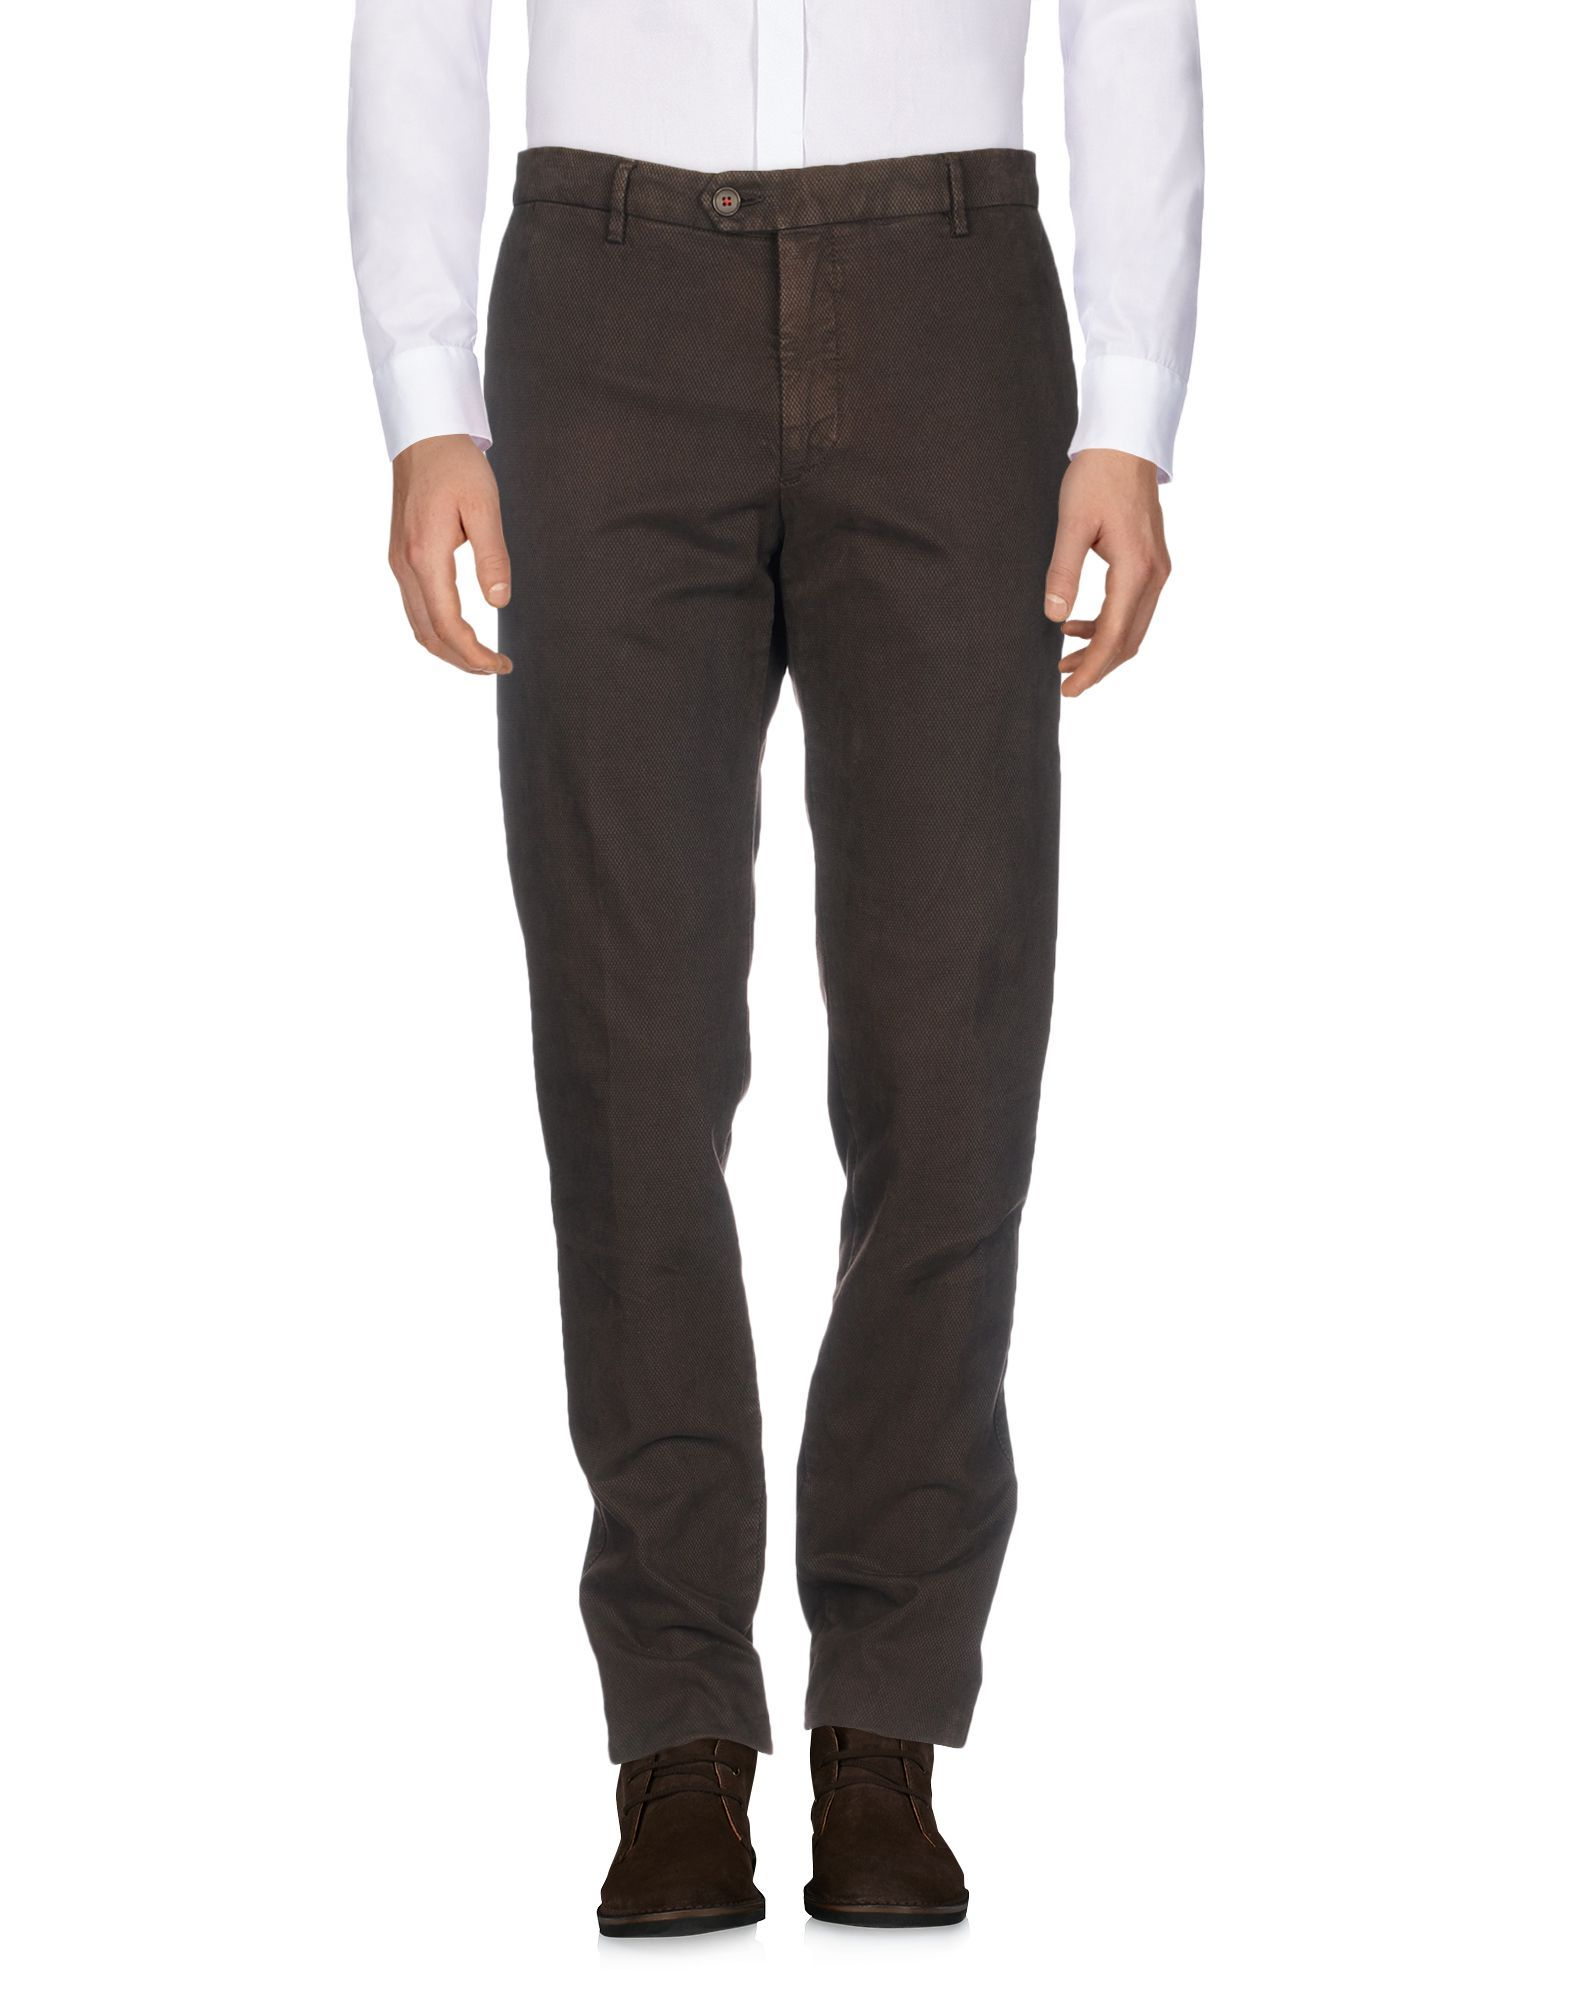 TROUSERS Maestrami Dark brown Man Cotton